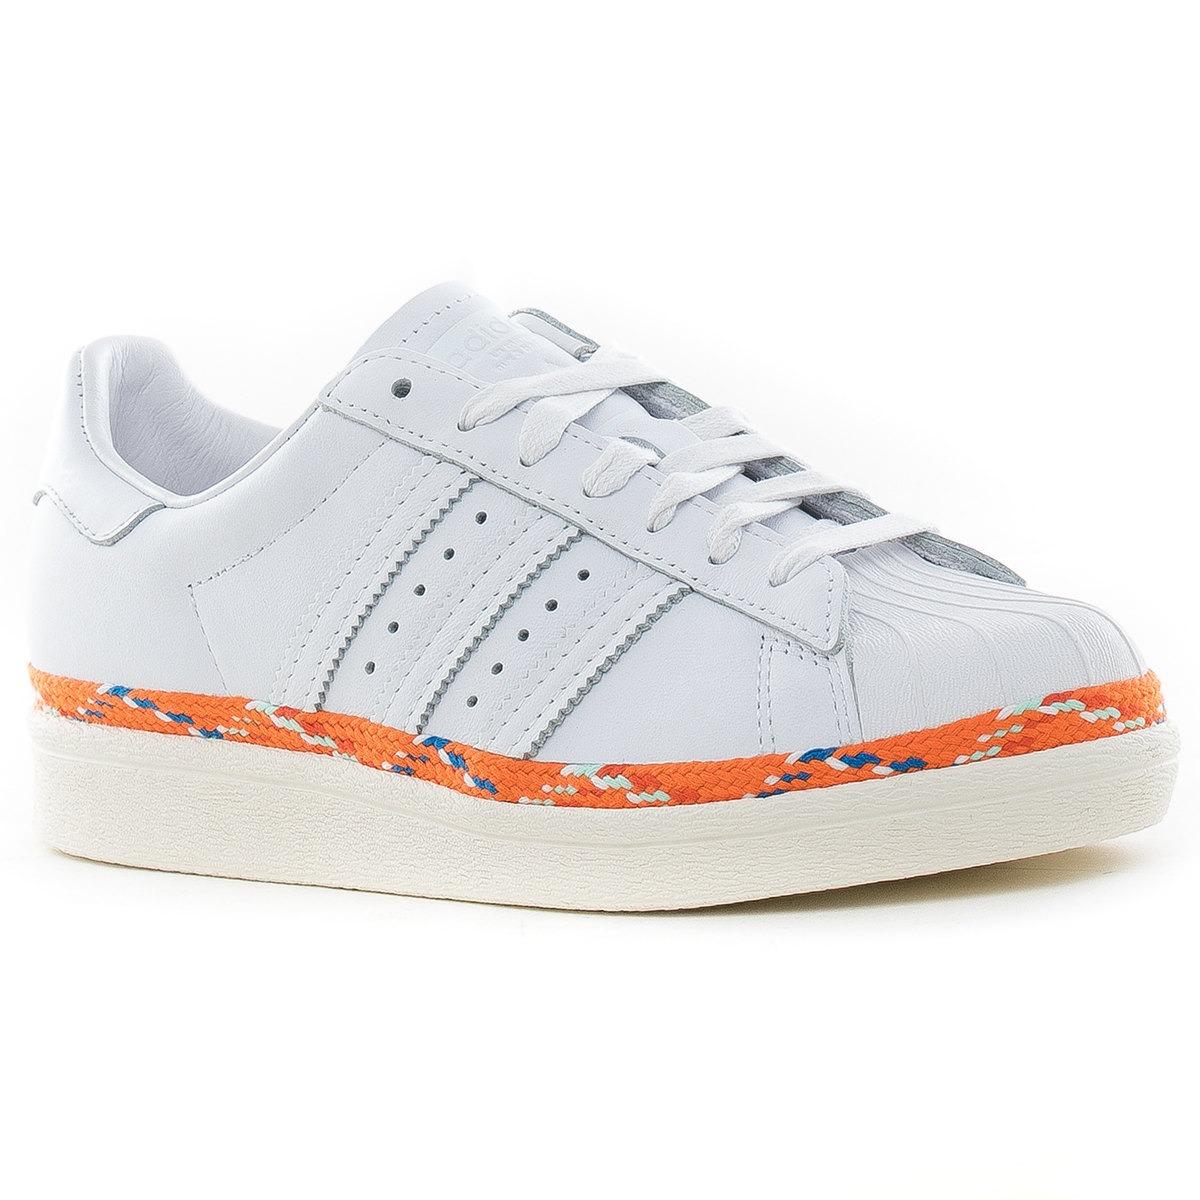 Zapatillas adidas Originals Superstar 80s New Bold W Aq0872